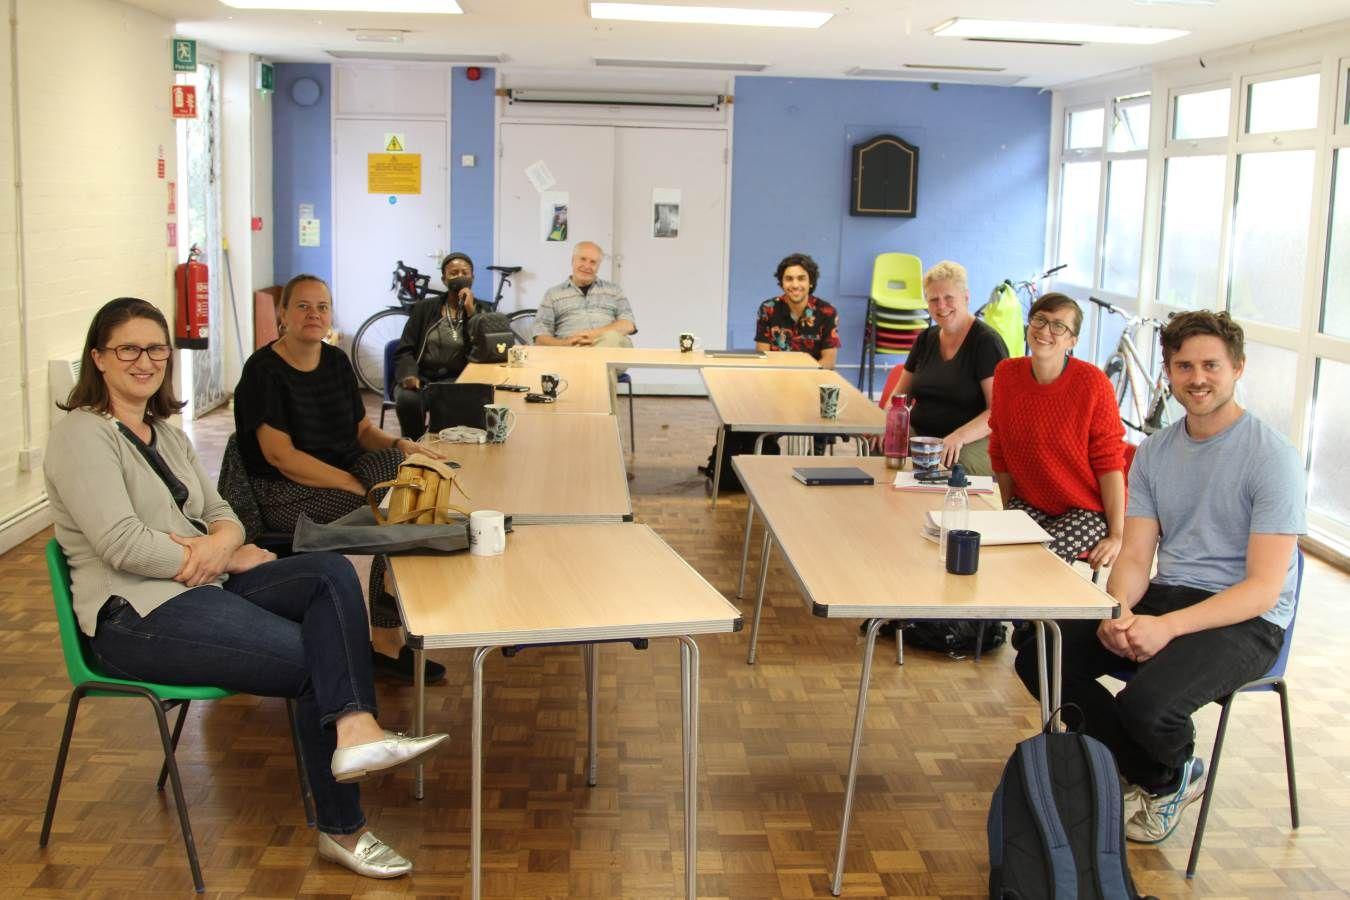 rgtb team pic ewart hall social distancing august 2020